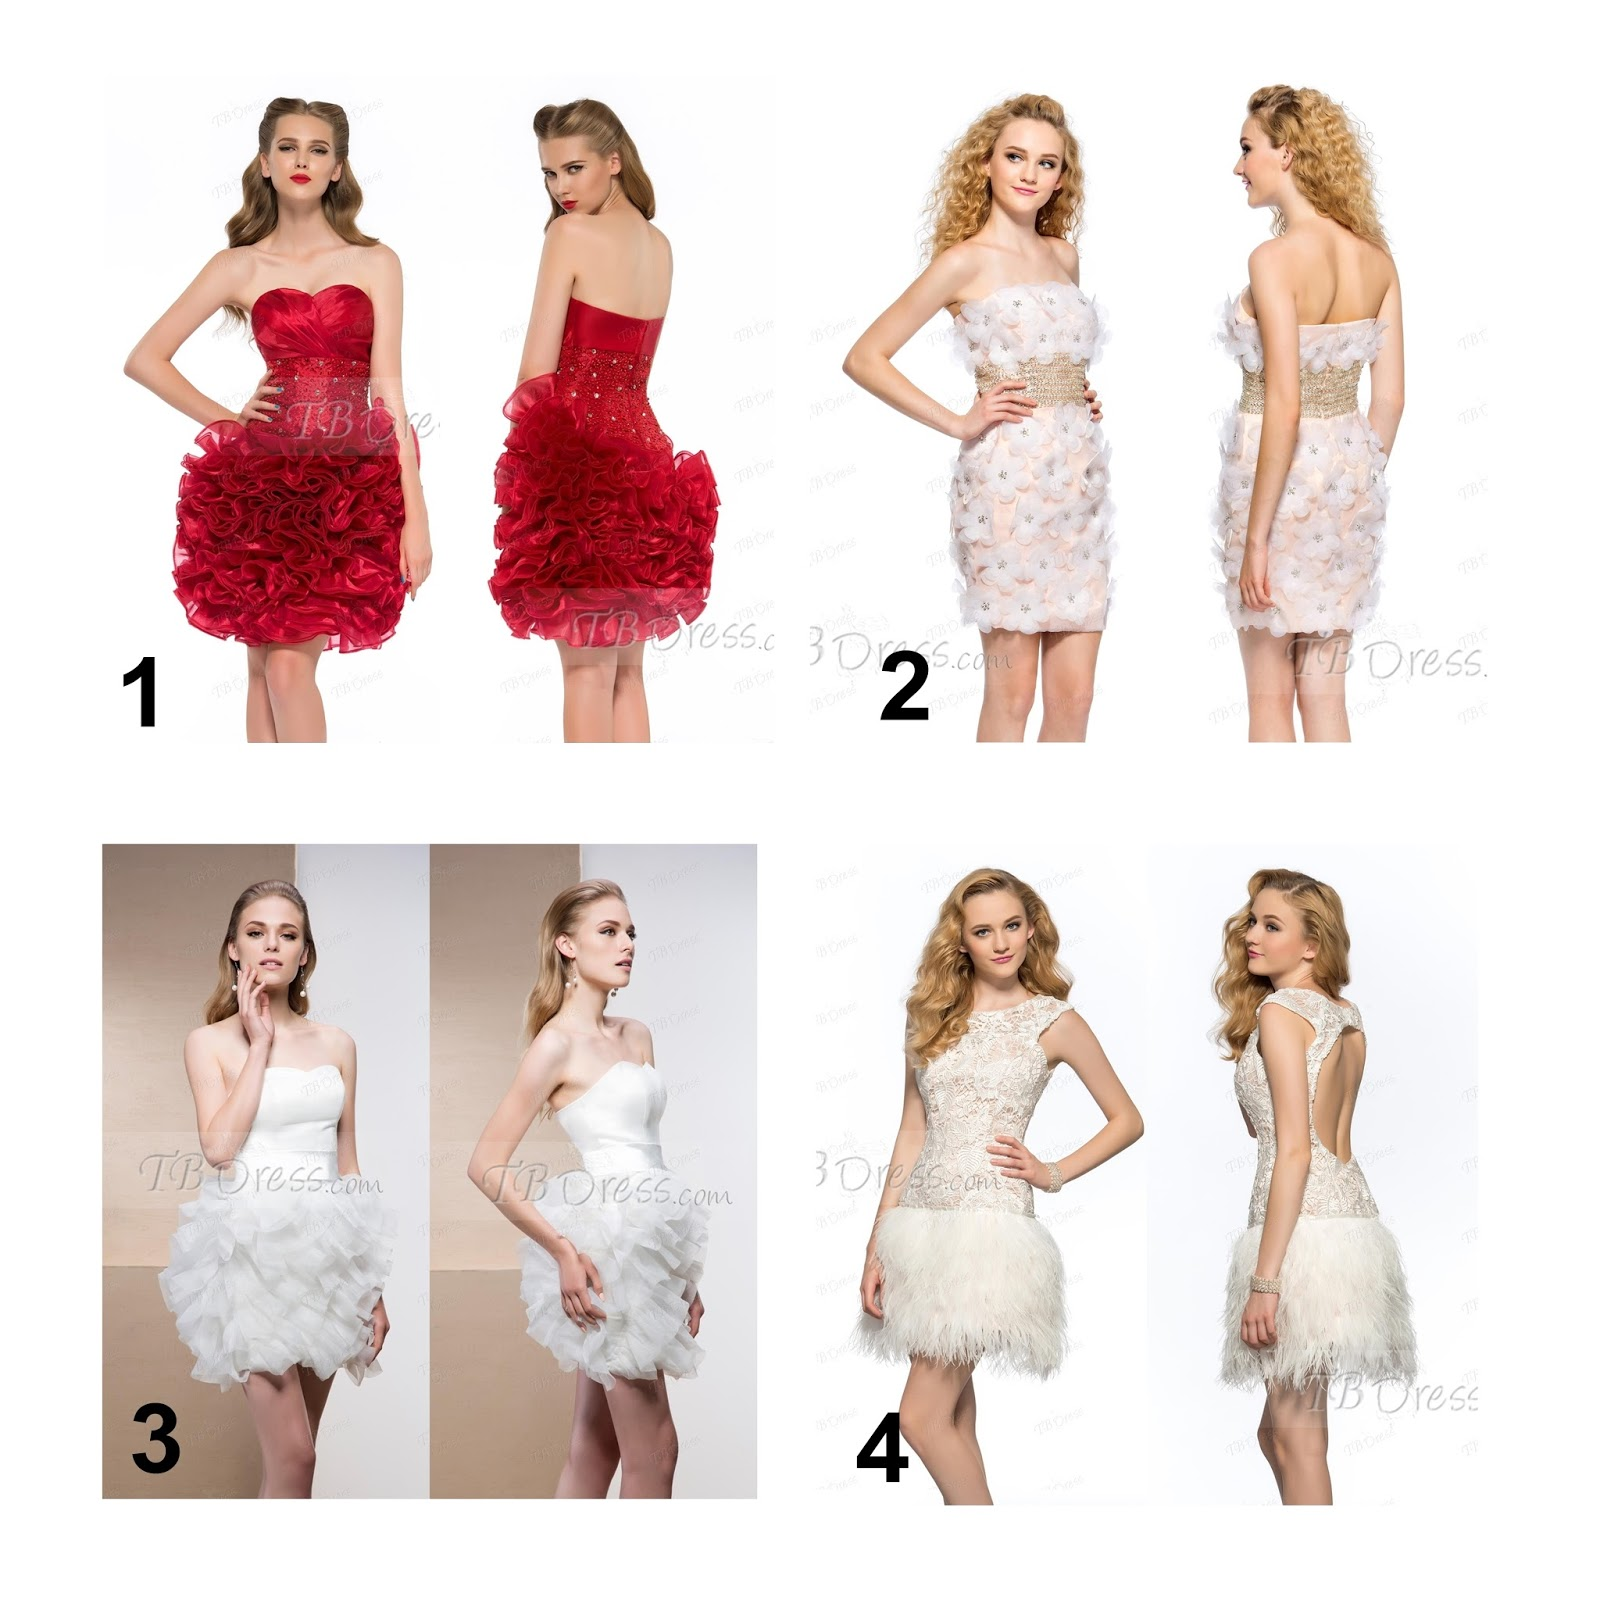 http://www.tbdress.com/Cheap-Homecoming-Dresses-2014-102332/